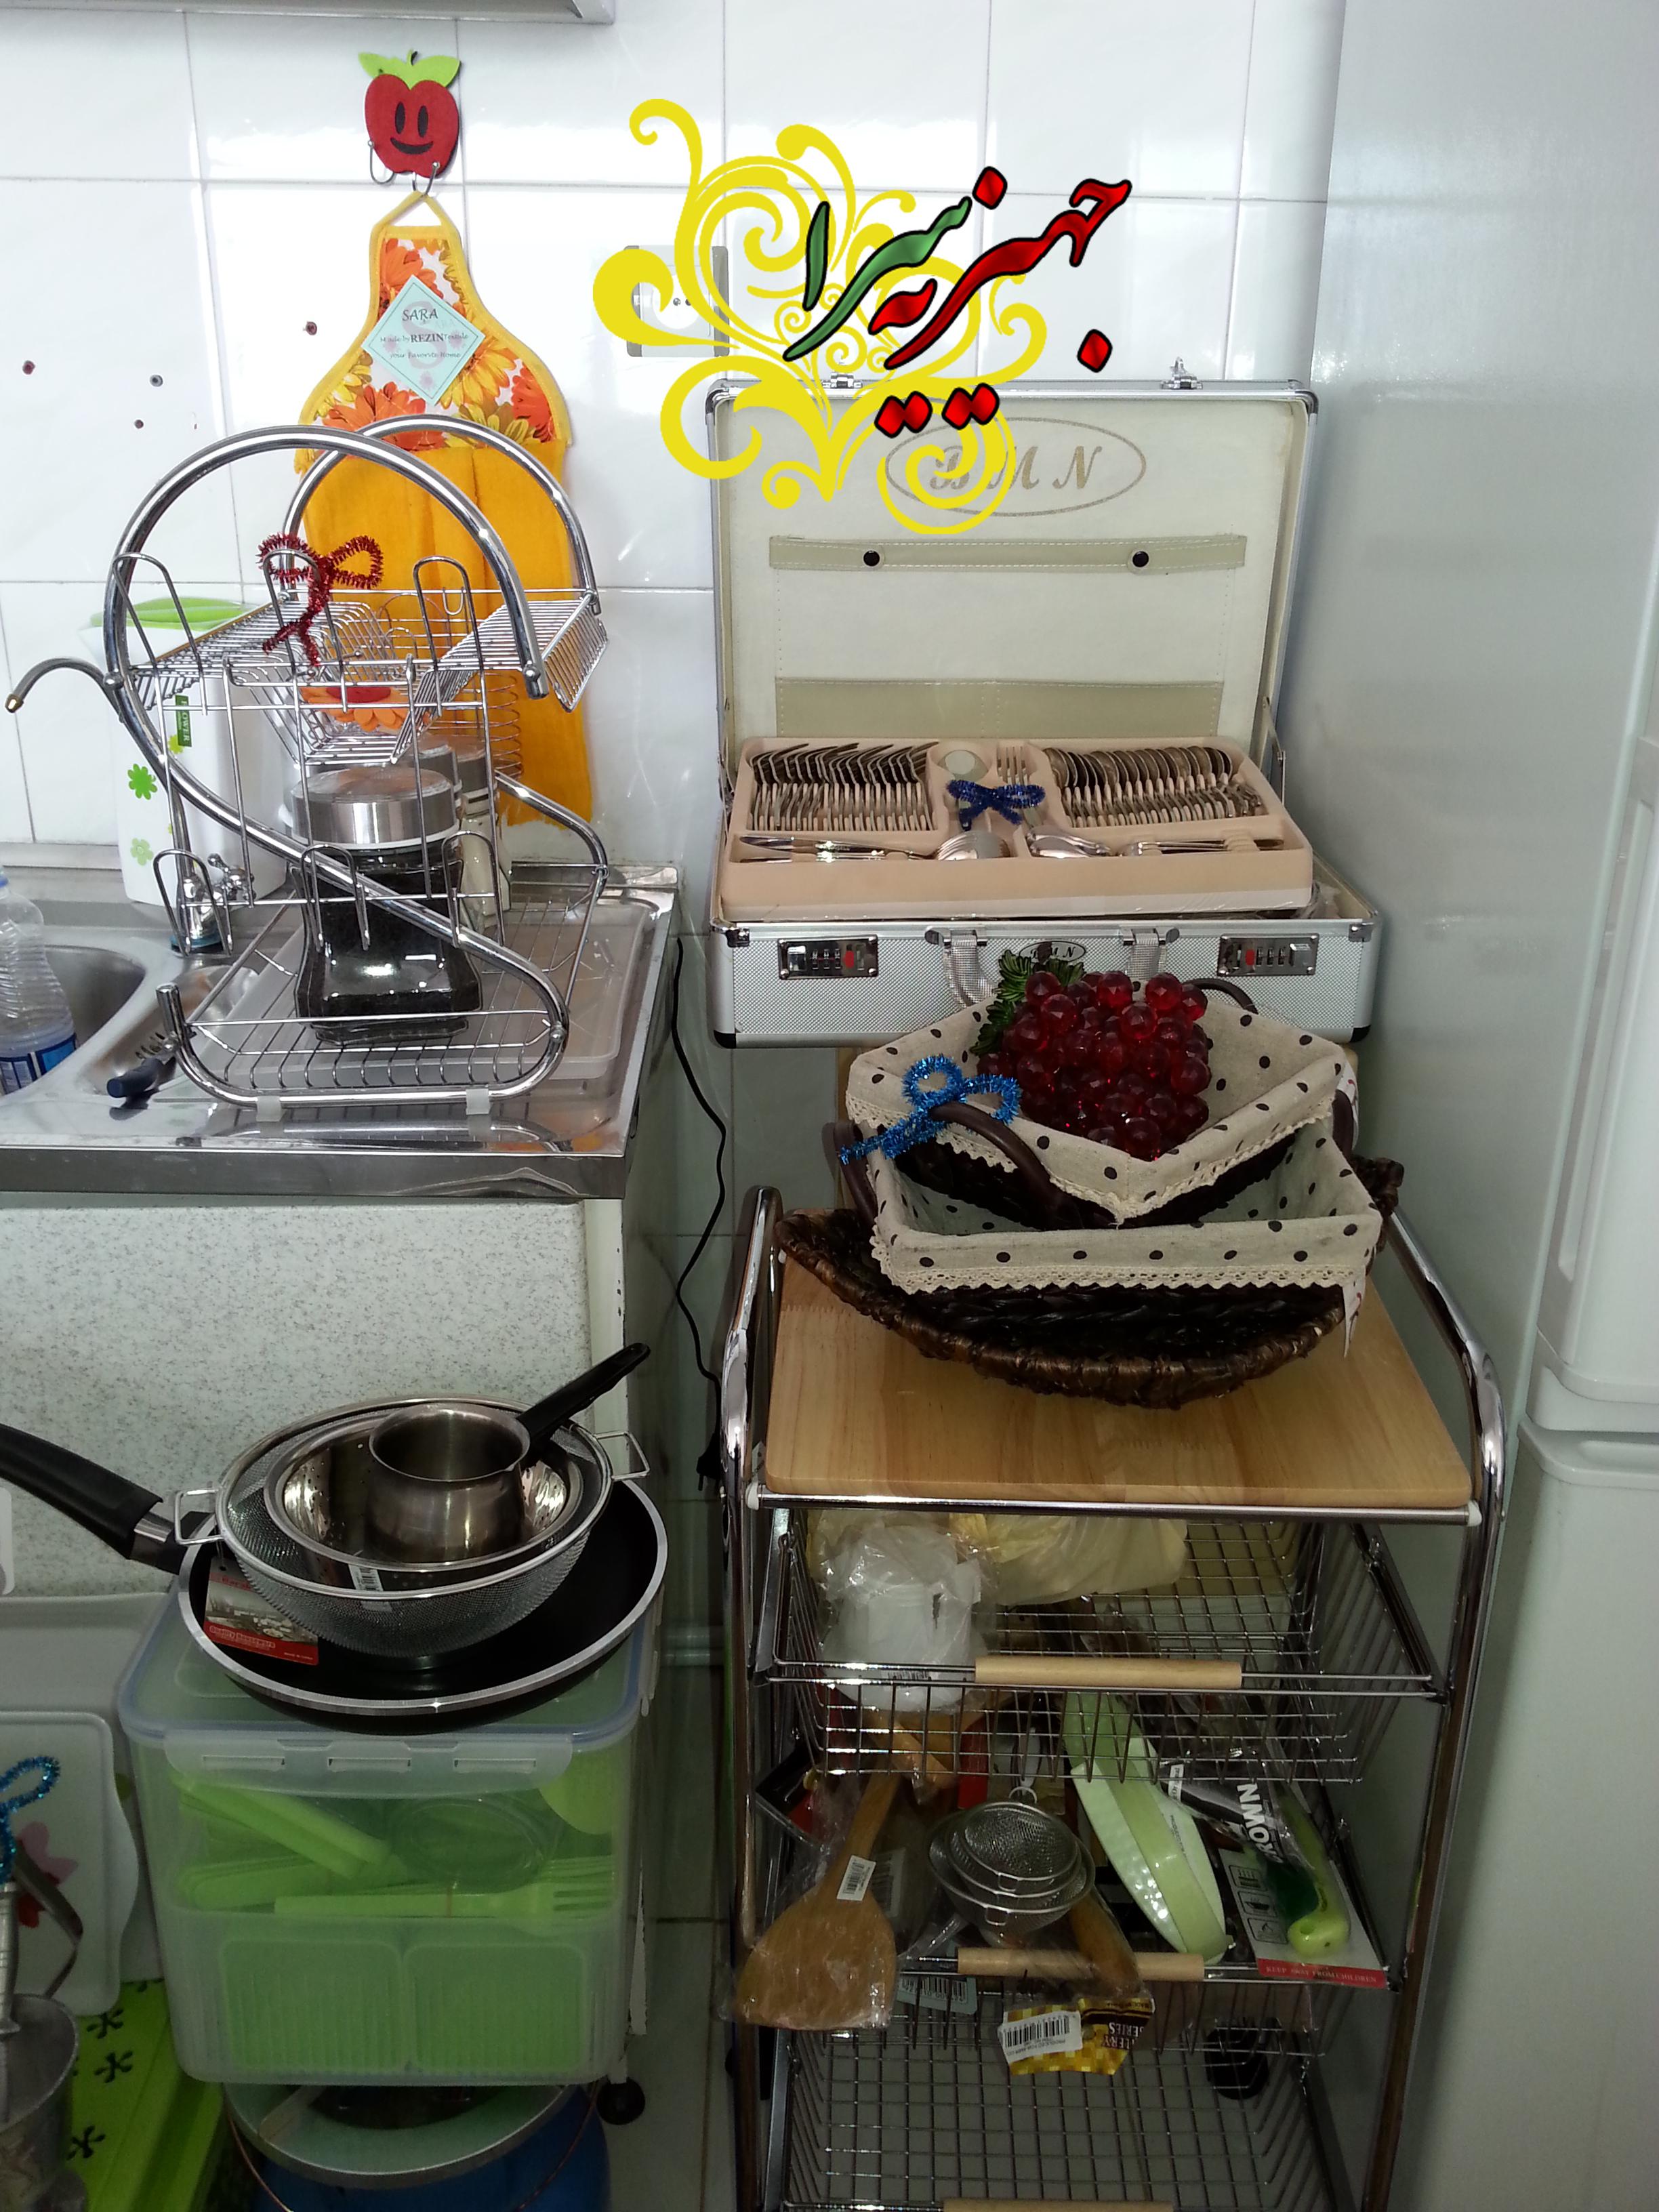 سرویس آشپزخانه جدید